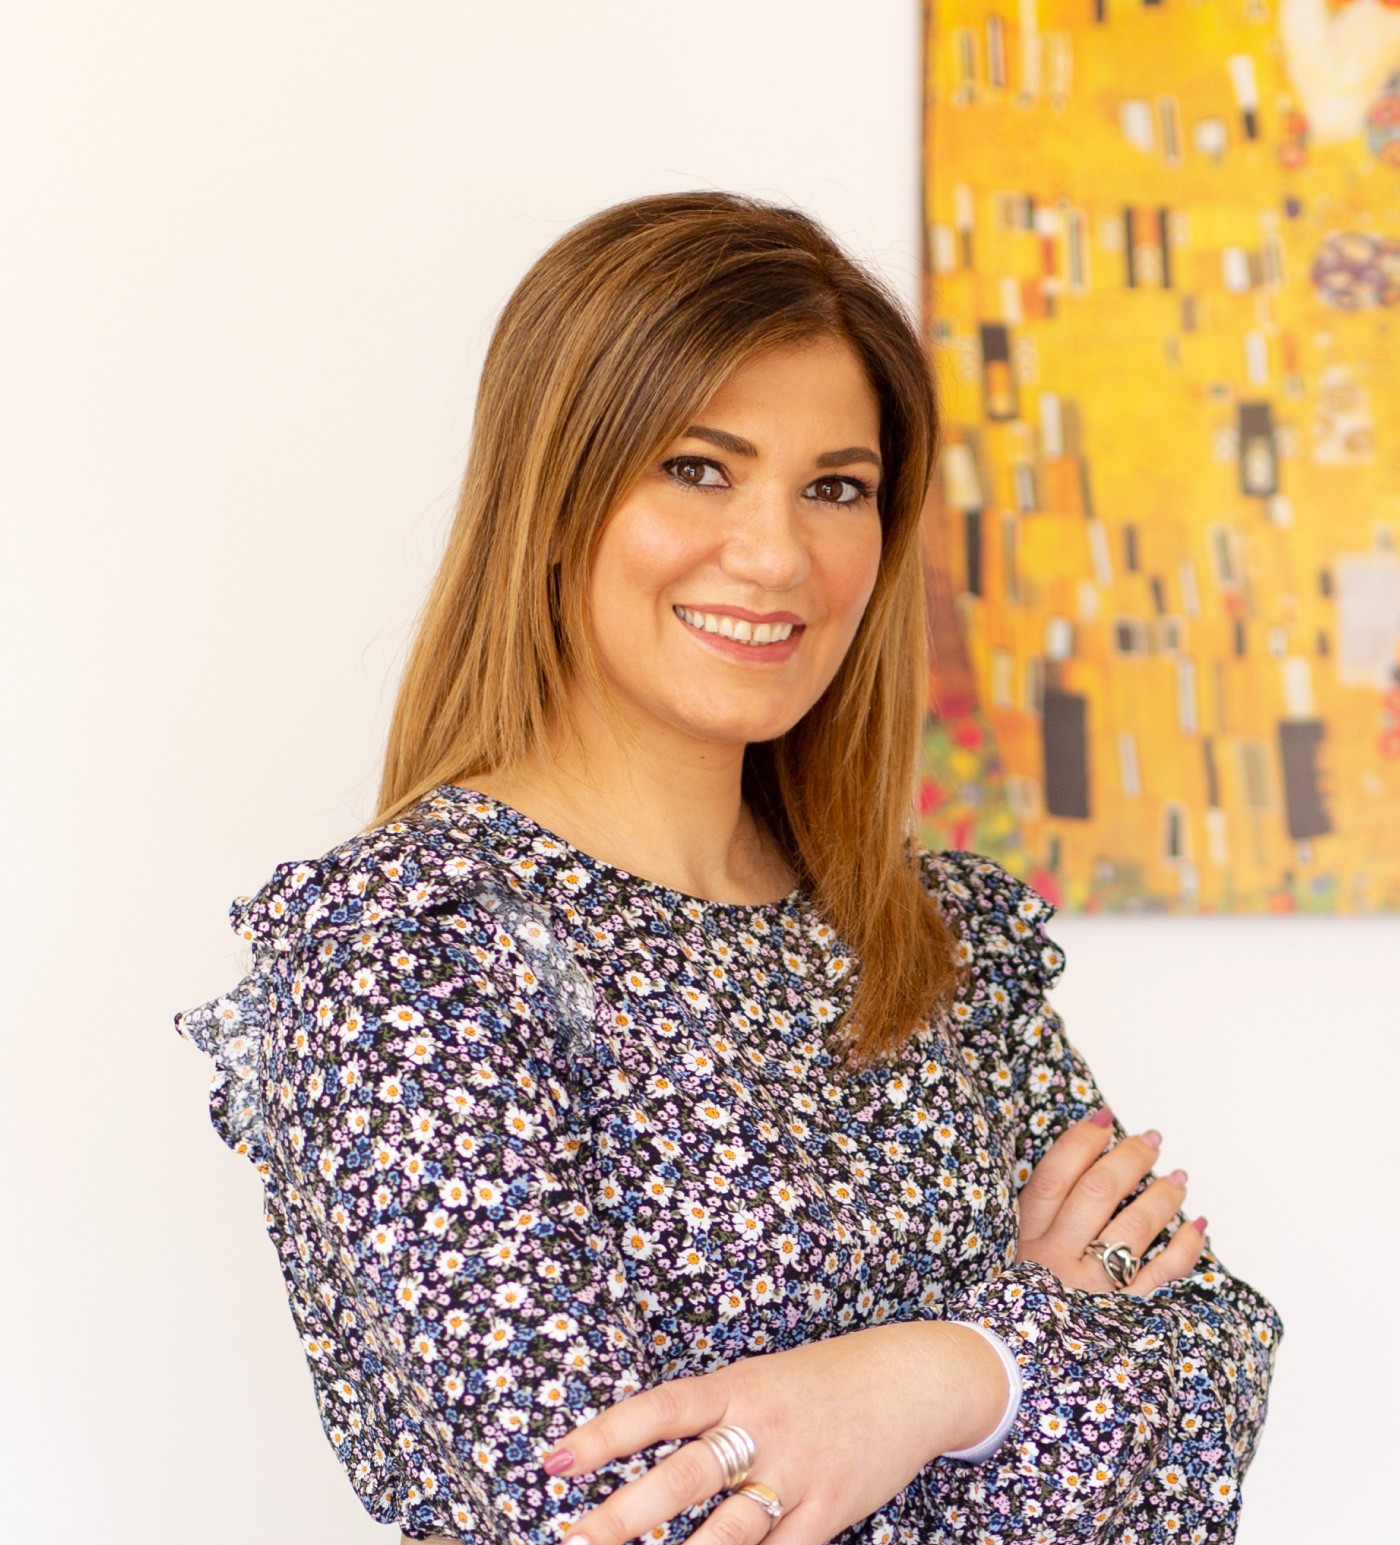 Dott.ssa Anna Borrelli